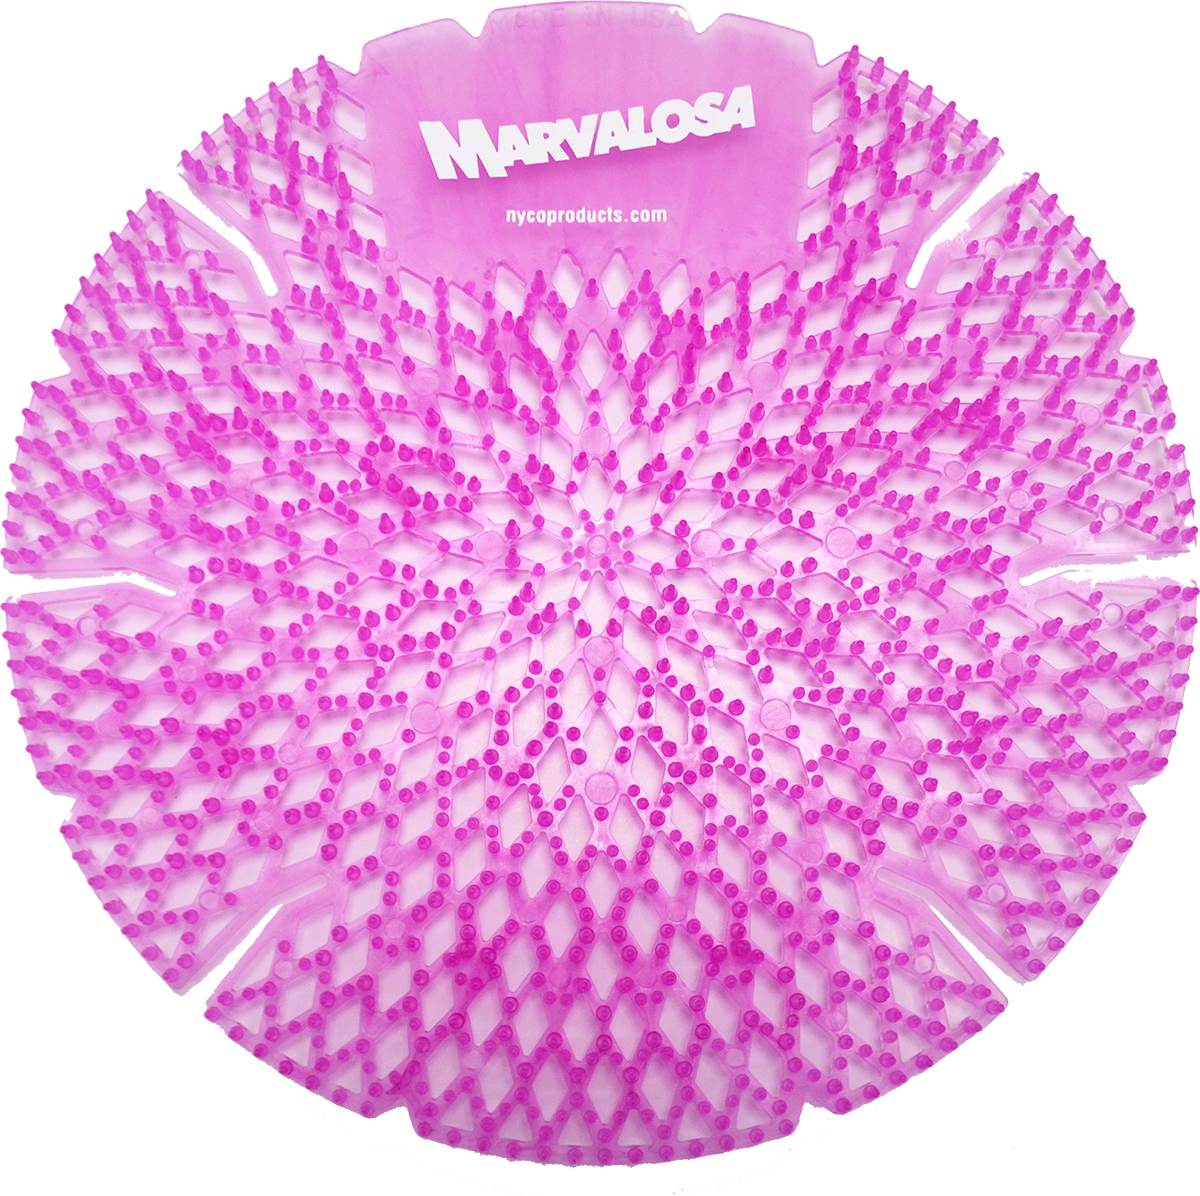 Nyco BD-276-10 odor control urinal screen - tropical breeze scent